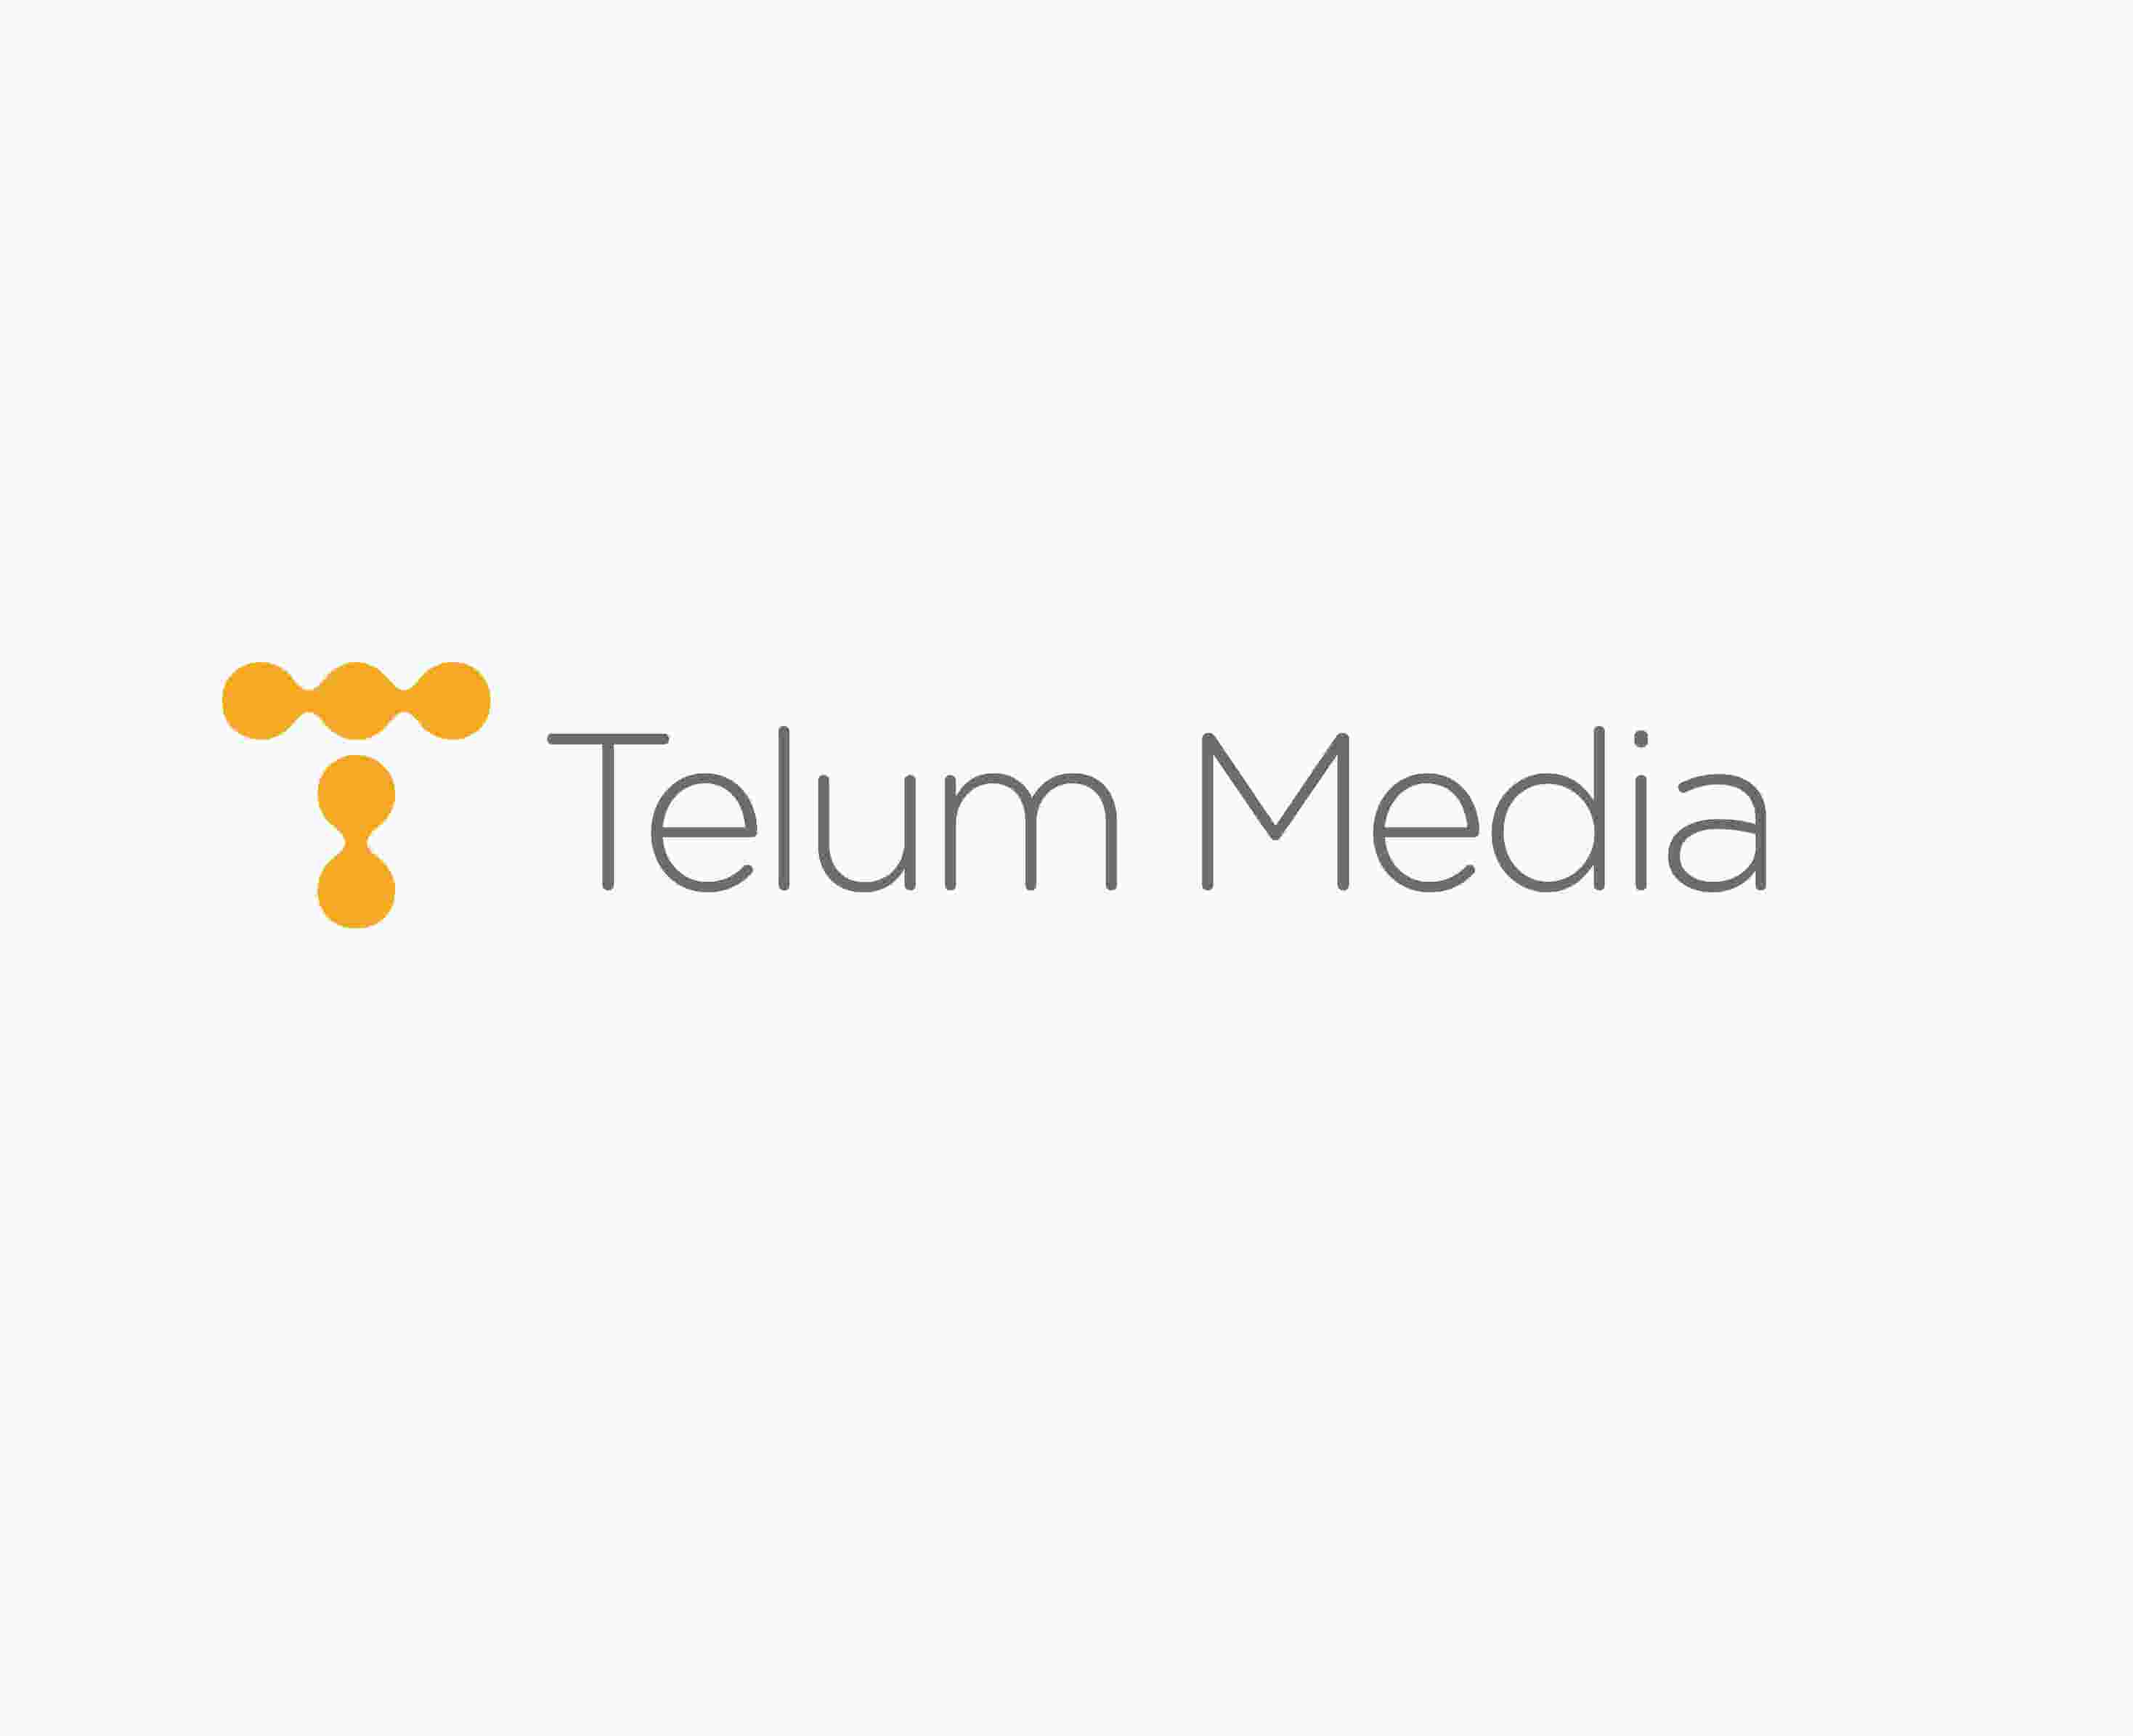 Telum Media (HK)